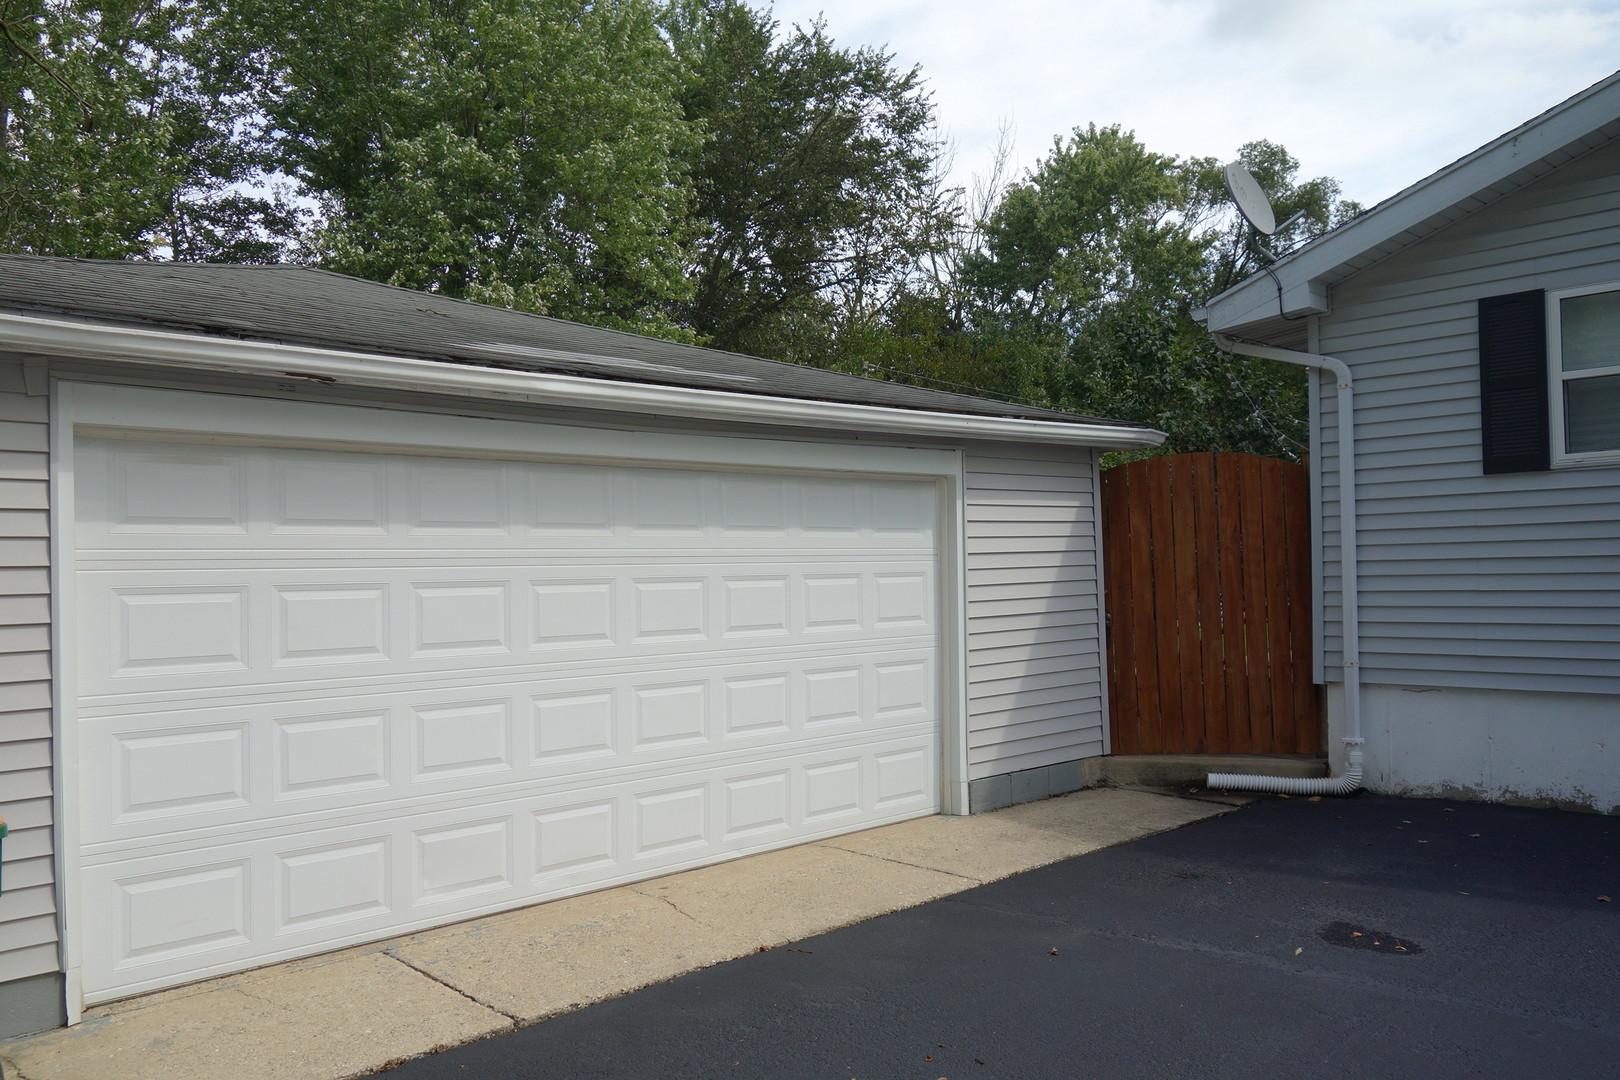 23132 West Marylou, Channahon, Illinois, 60410